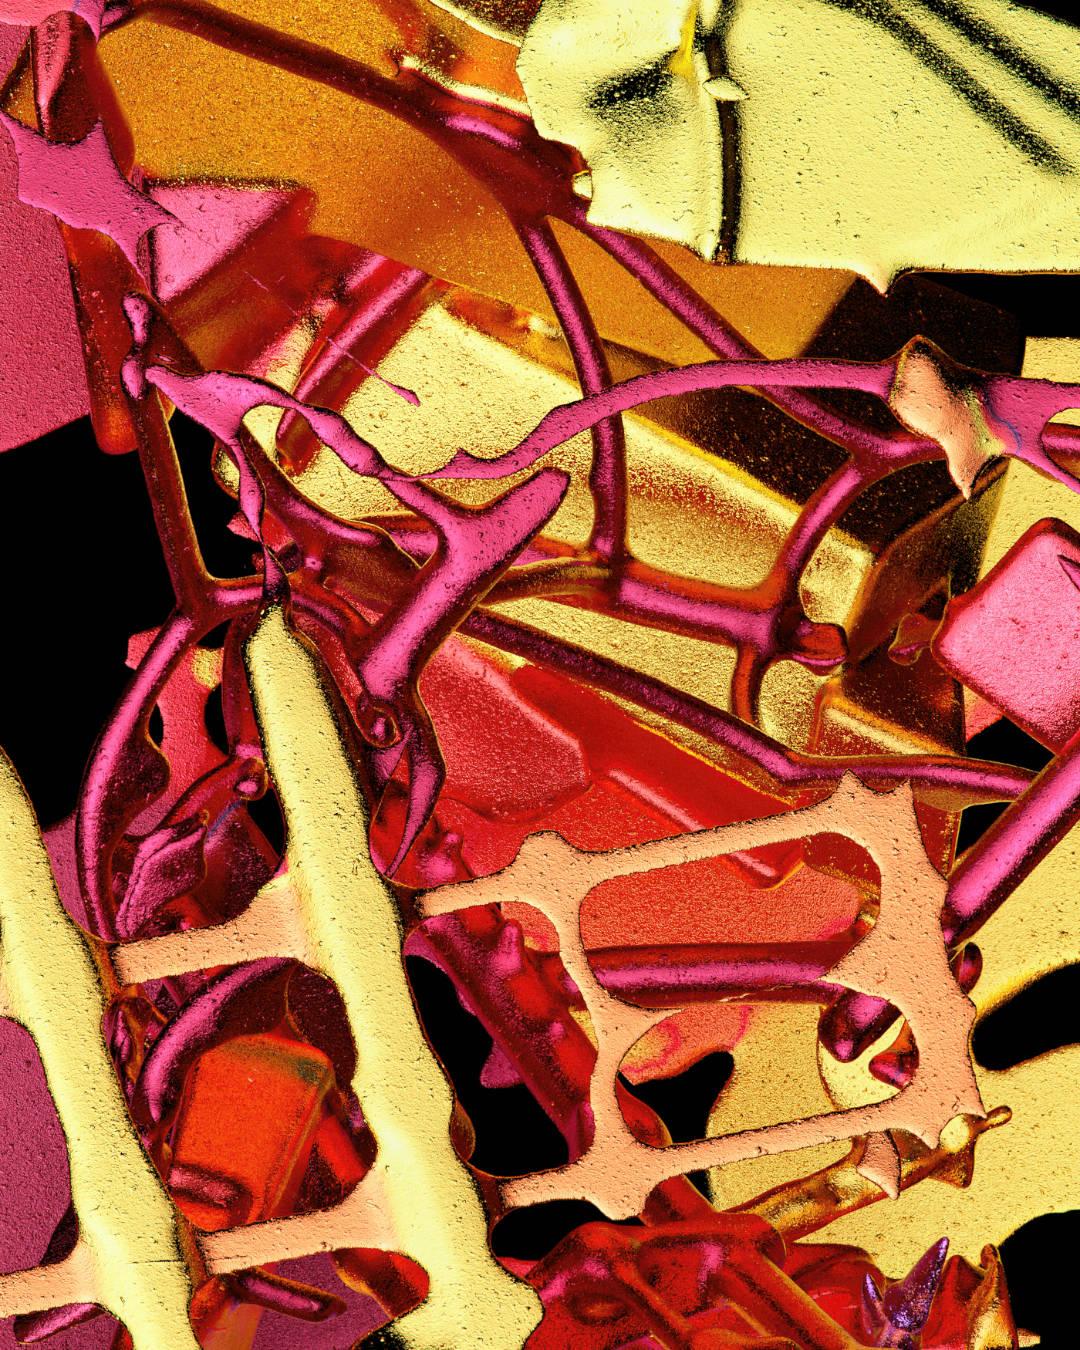 fakenewstudio_x_danny_ivan_synthetic_fossils_04